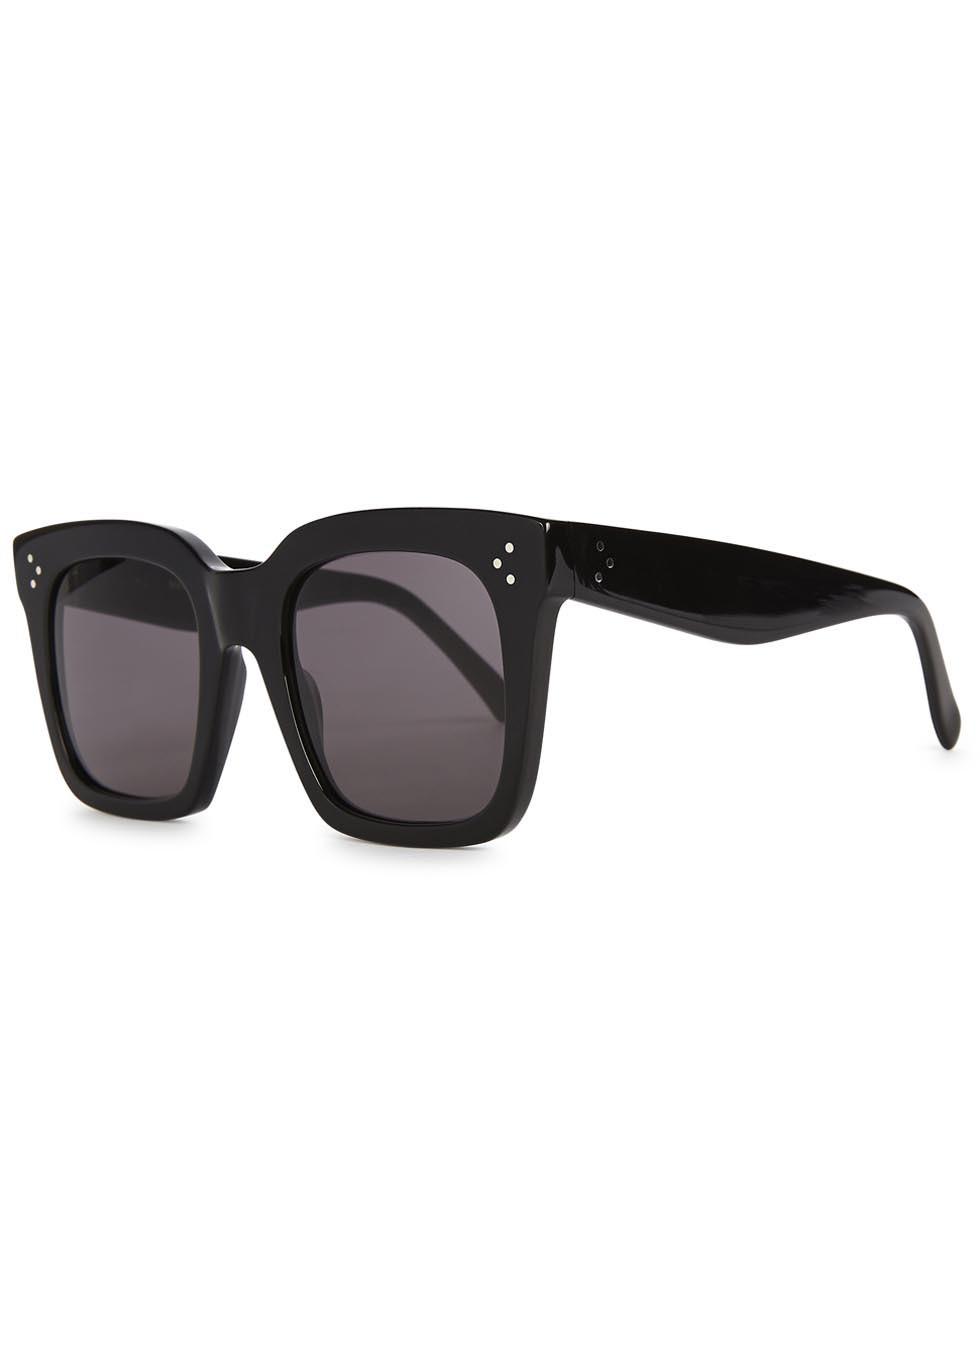 93c8d43e0e6 Céline Tilda black wayfarer style sunglasses